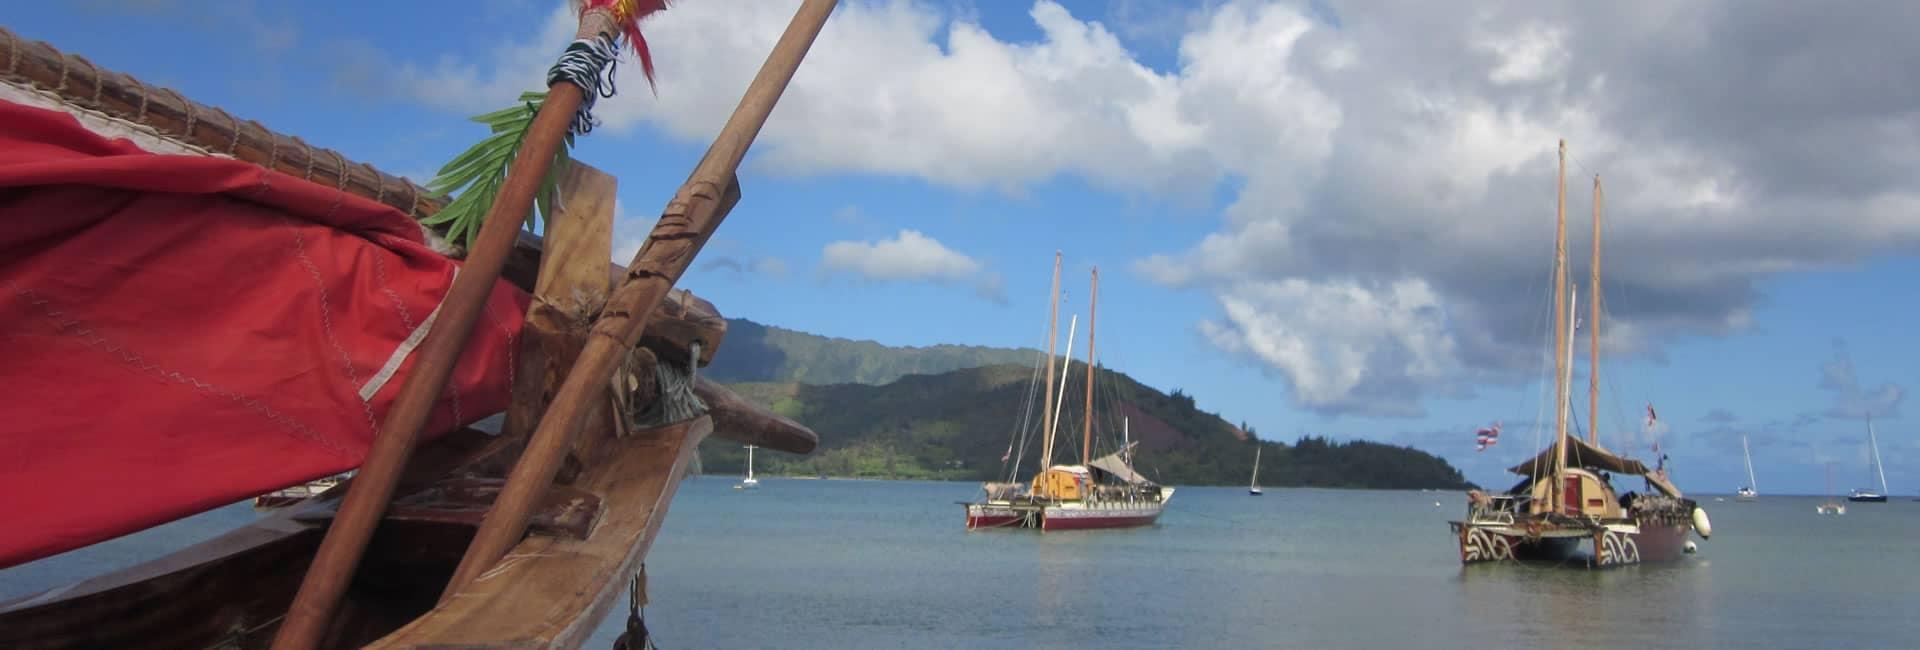 North Shore Kauai Vacation Rentals (@northshorekauai) Cover Image